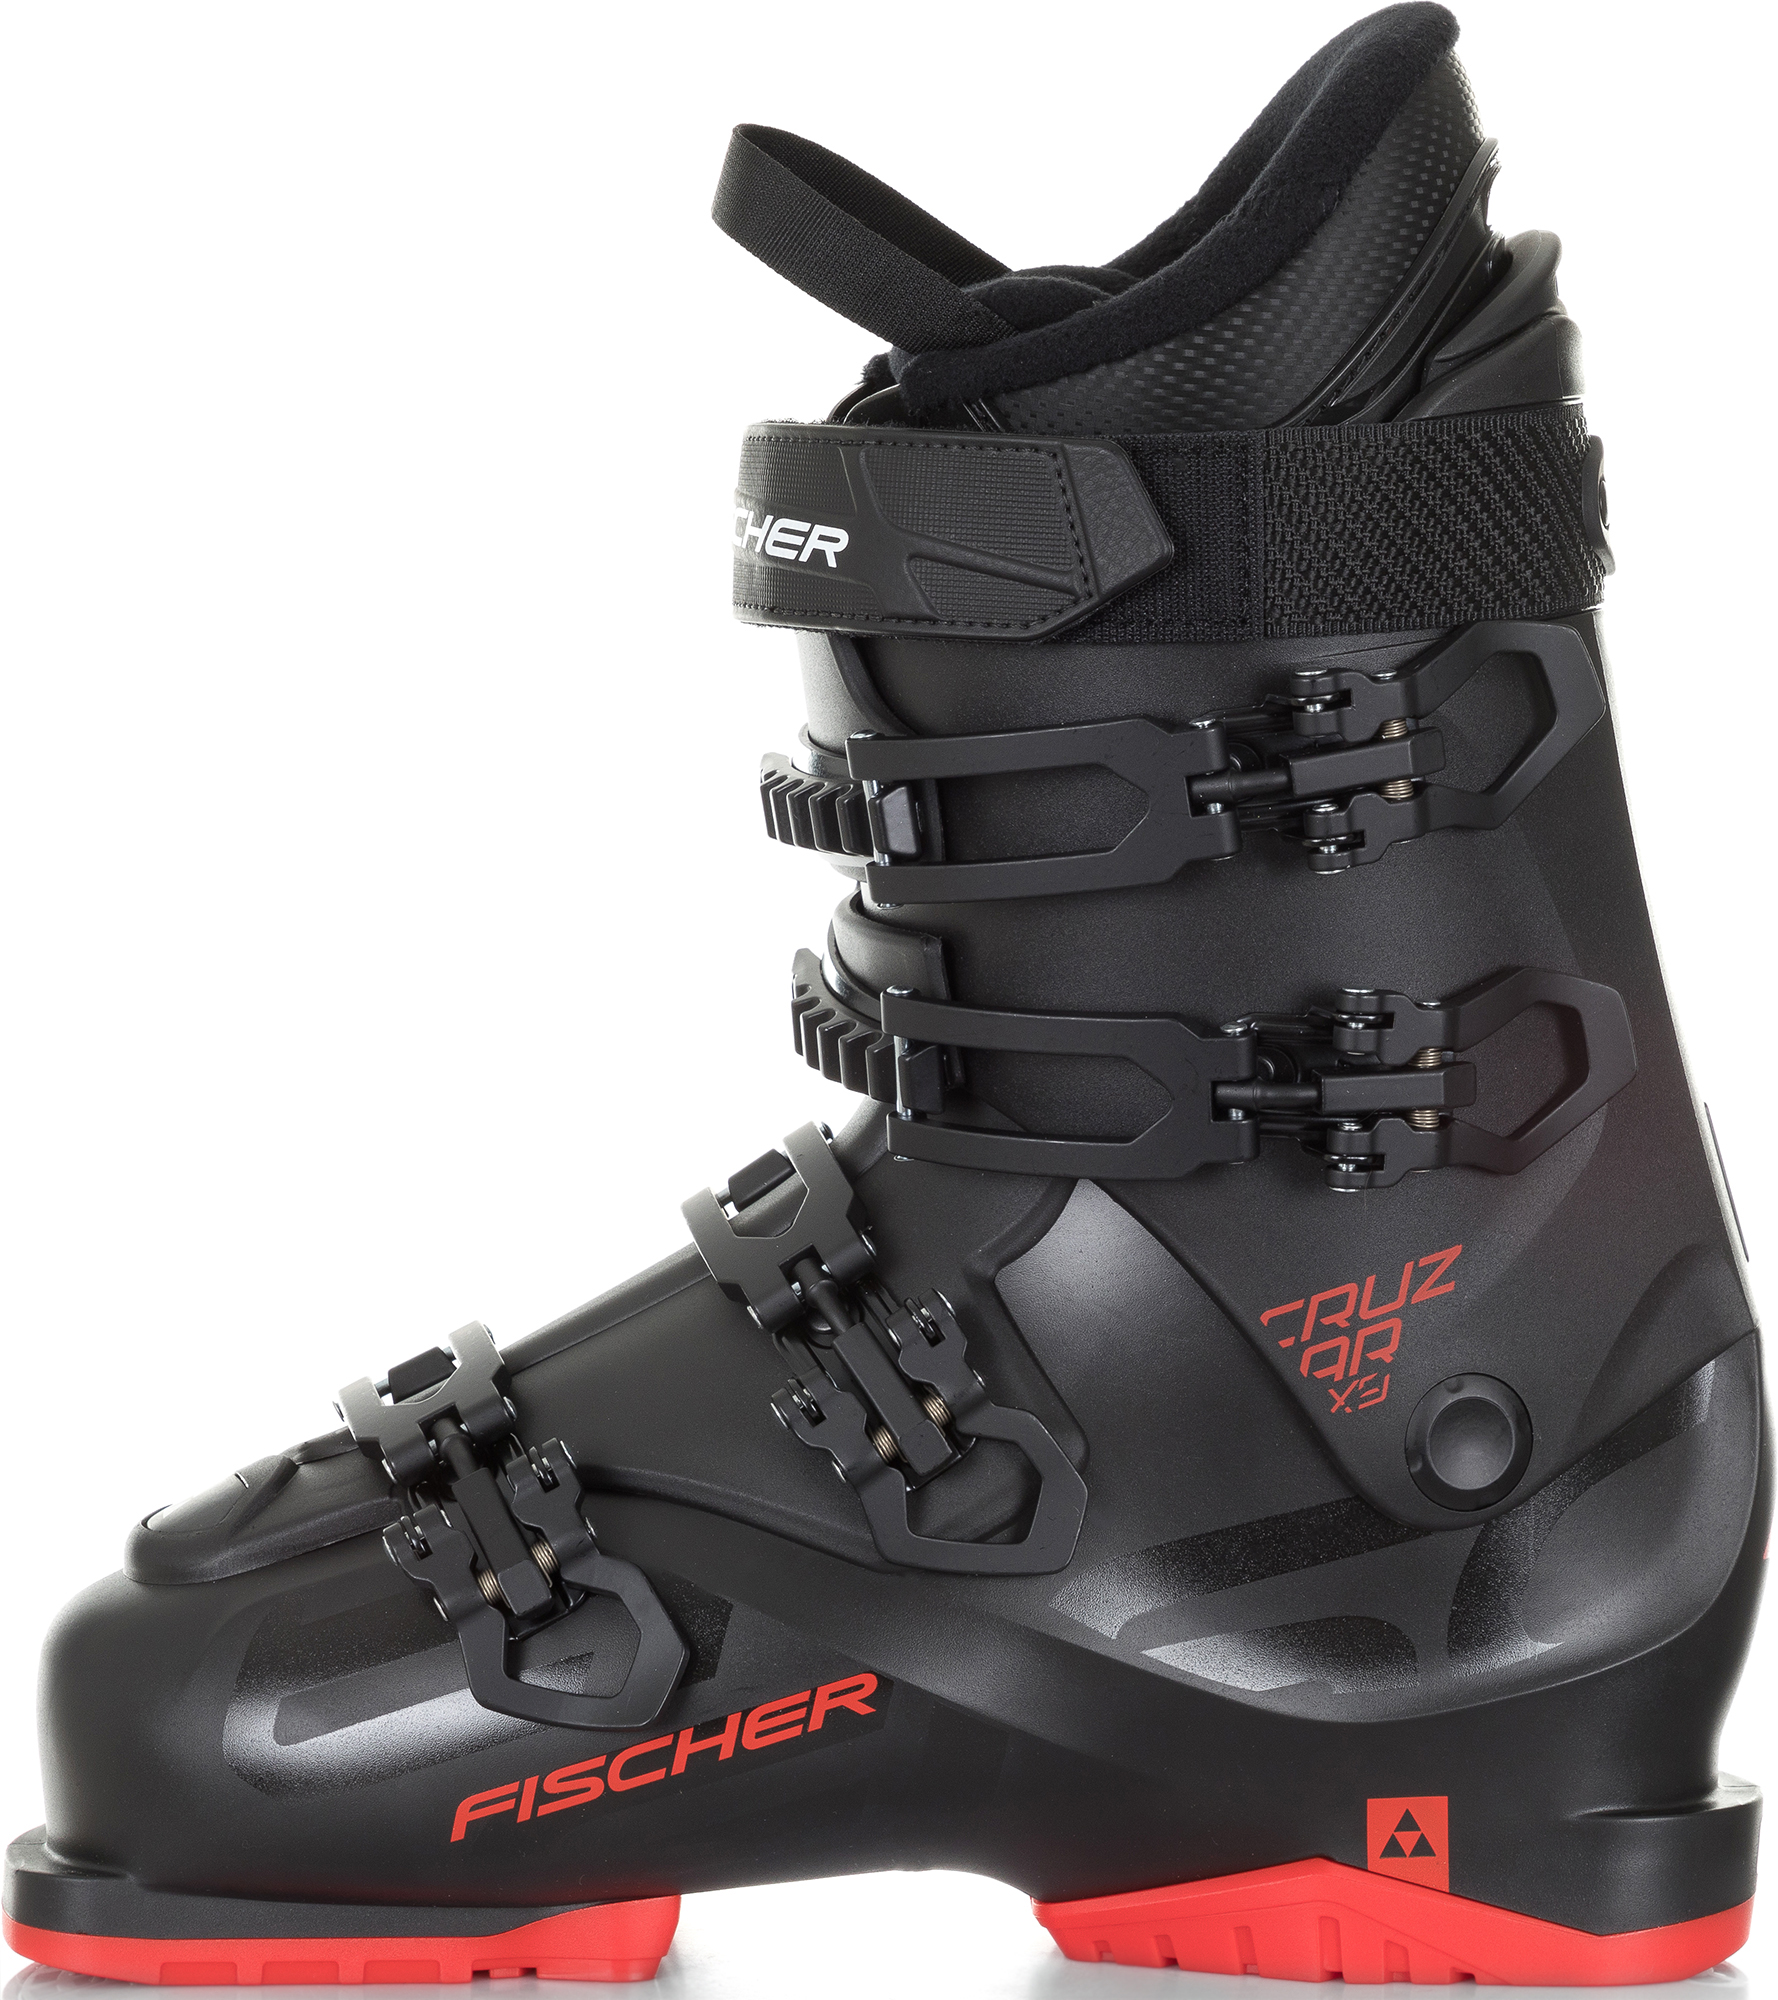 цена на Fischer Ботинки горнолыжные Fischer CRUZAR X 9,0 THERMOSHAPE, размер 46.5